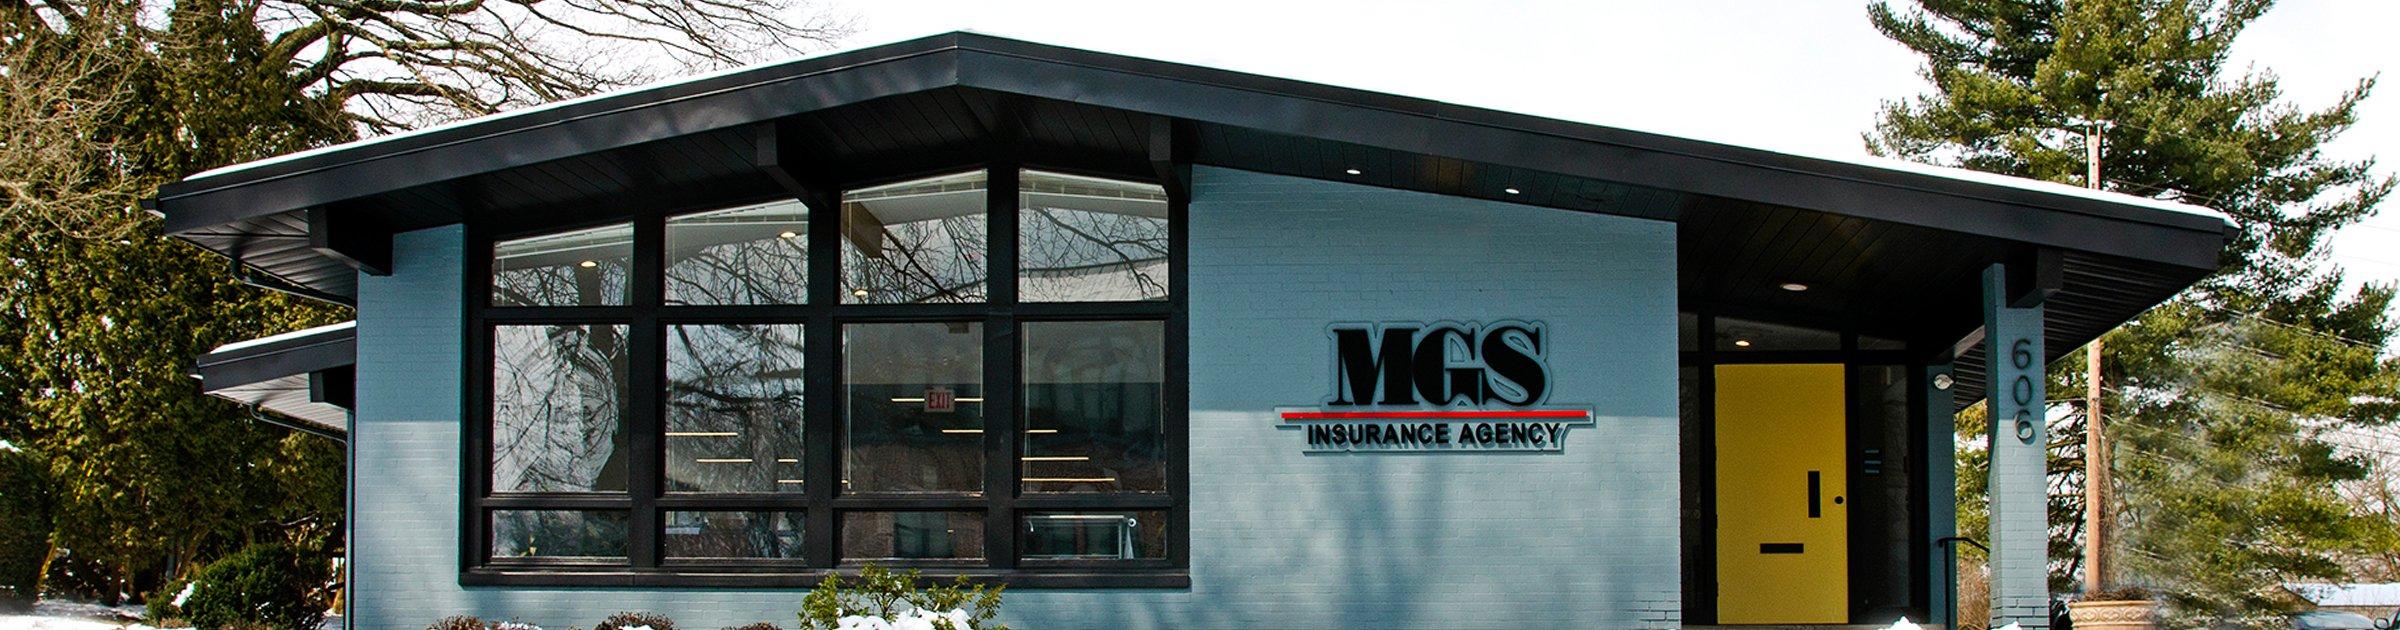 MGS Insurance Agency Office